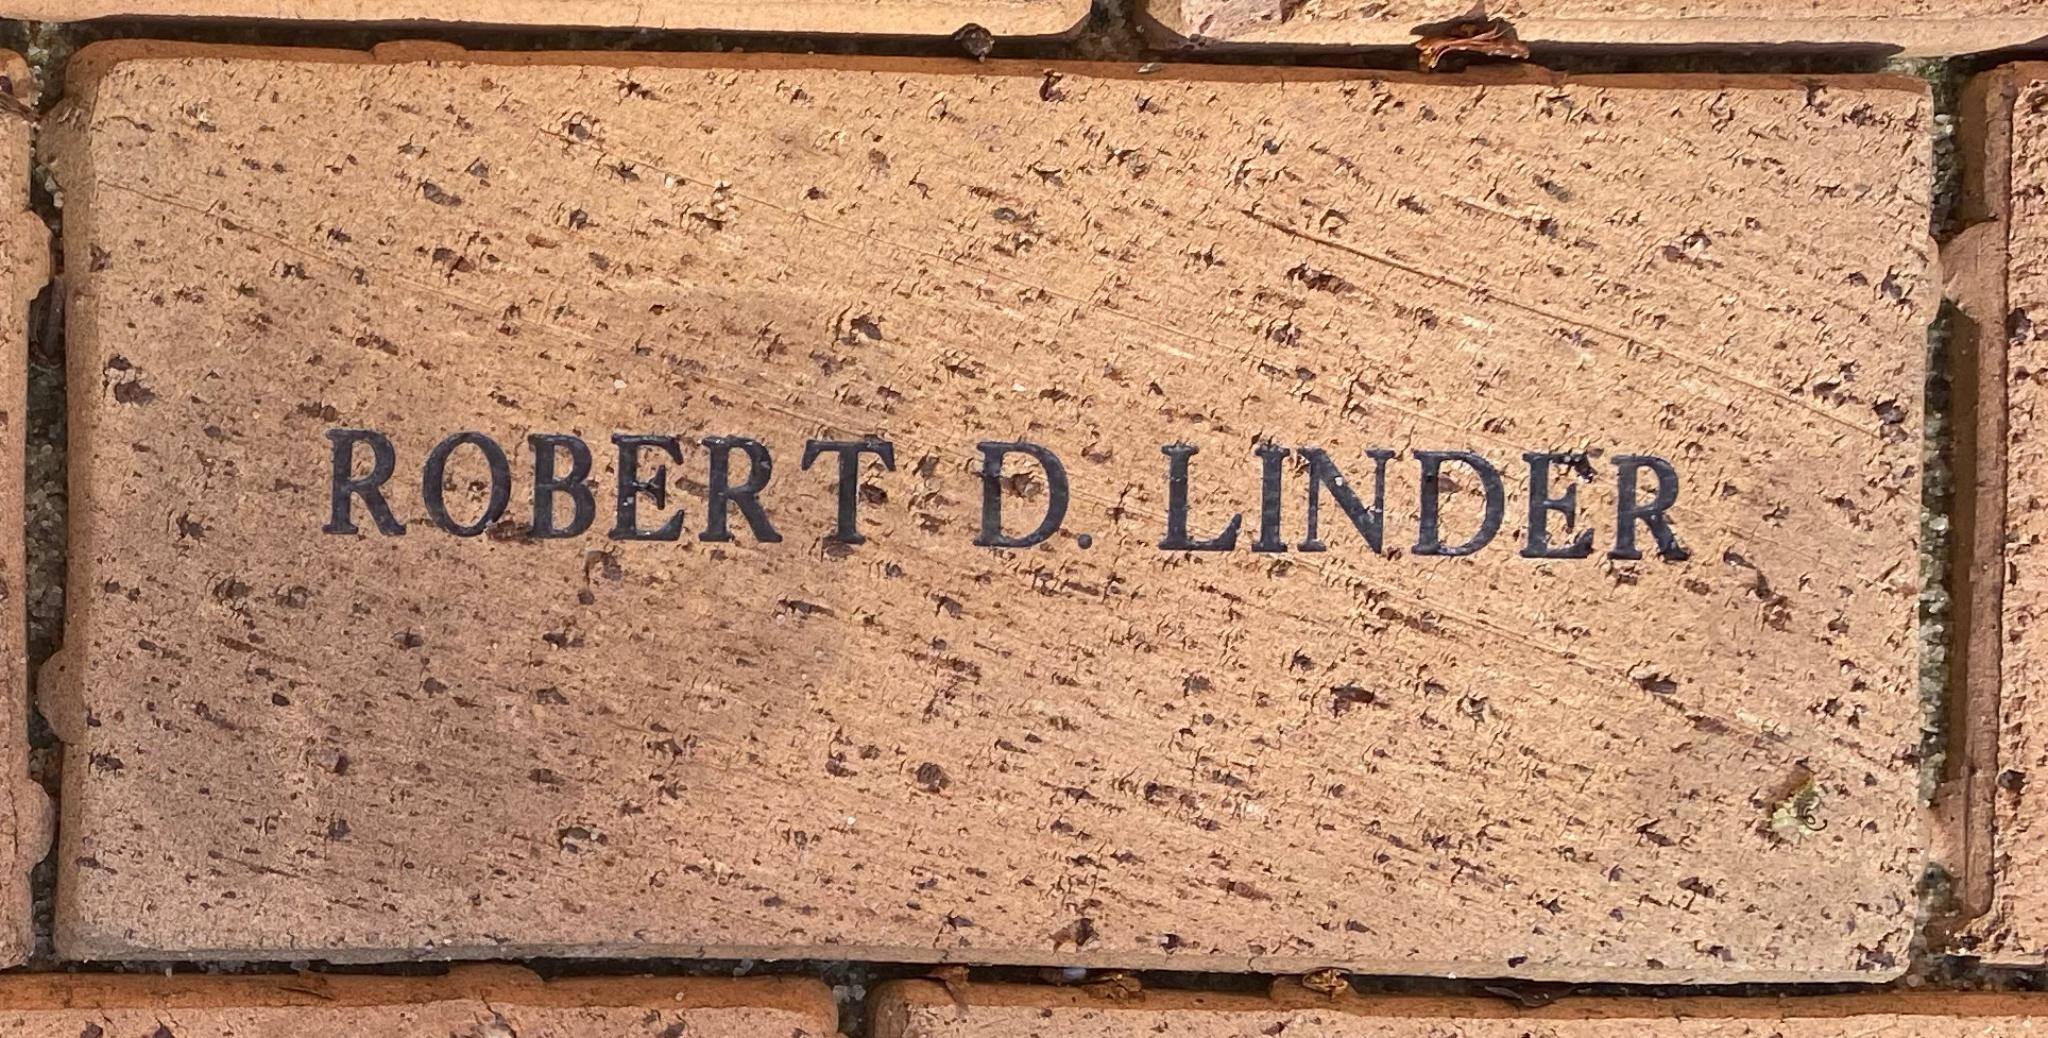 ROBERT D. LINDER